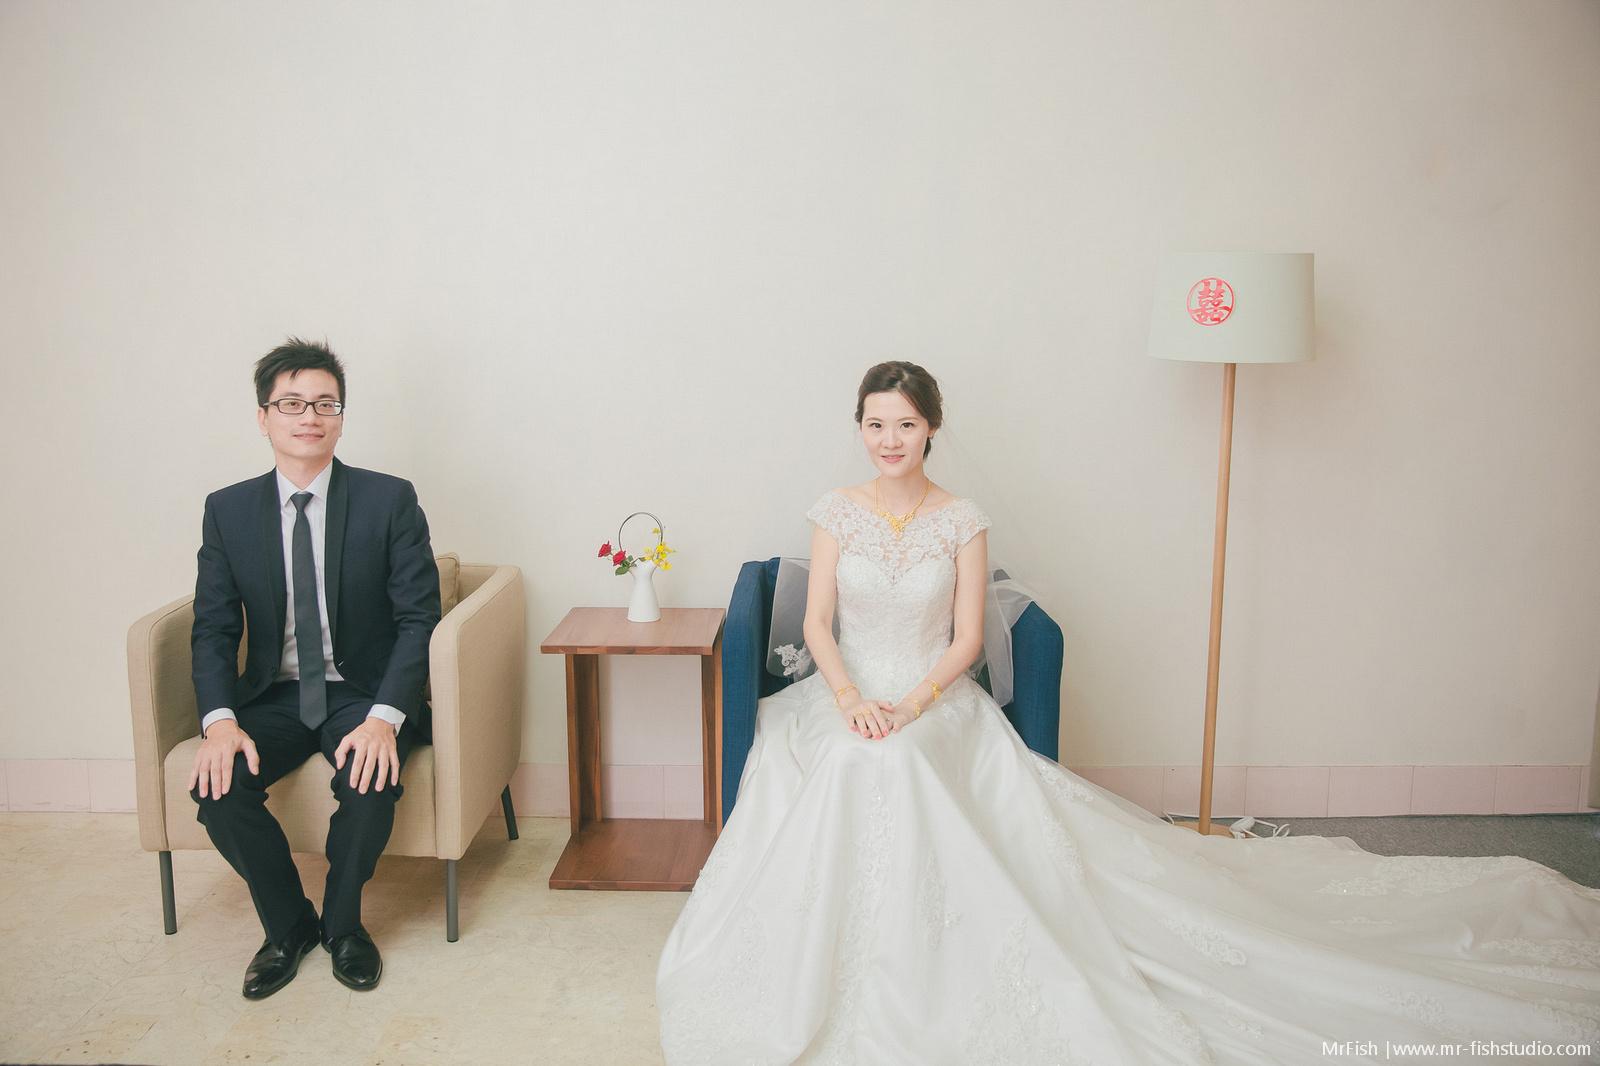 【Wedding】怡茹+子翔